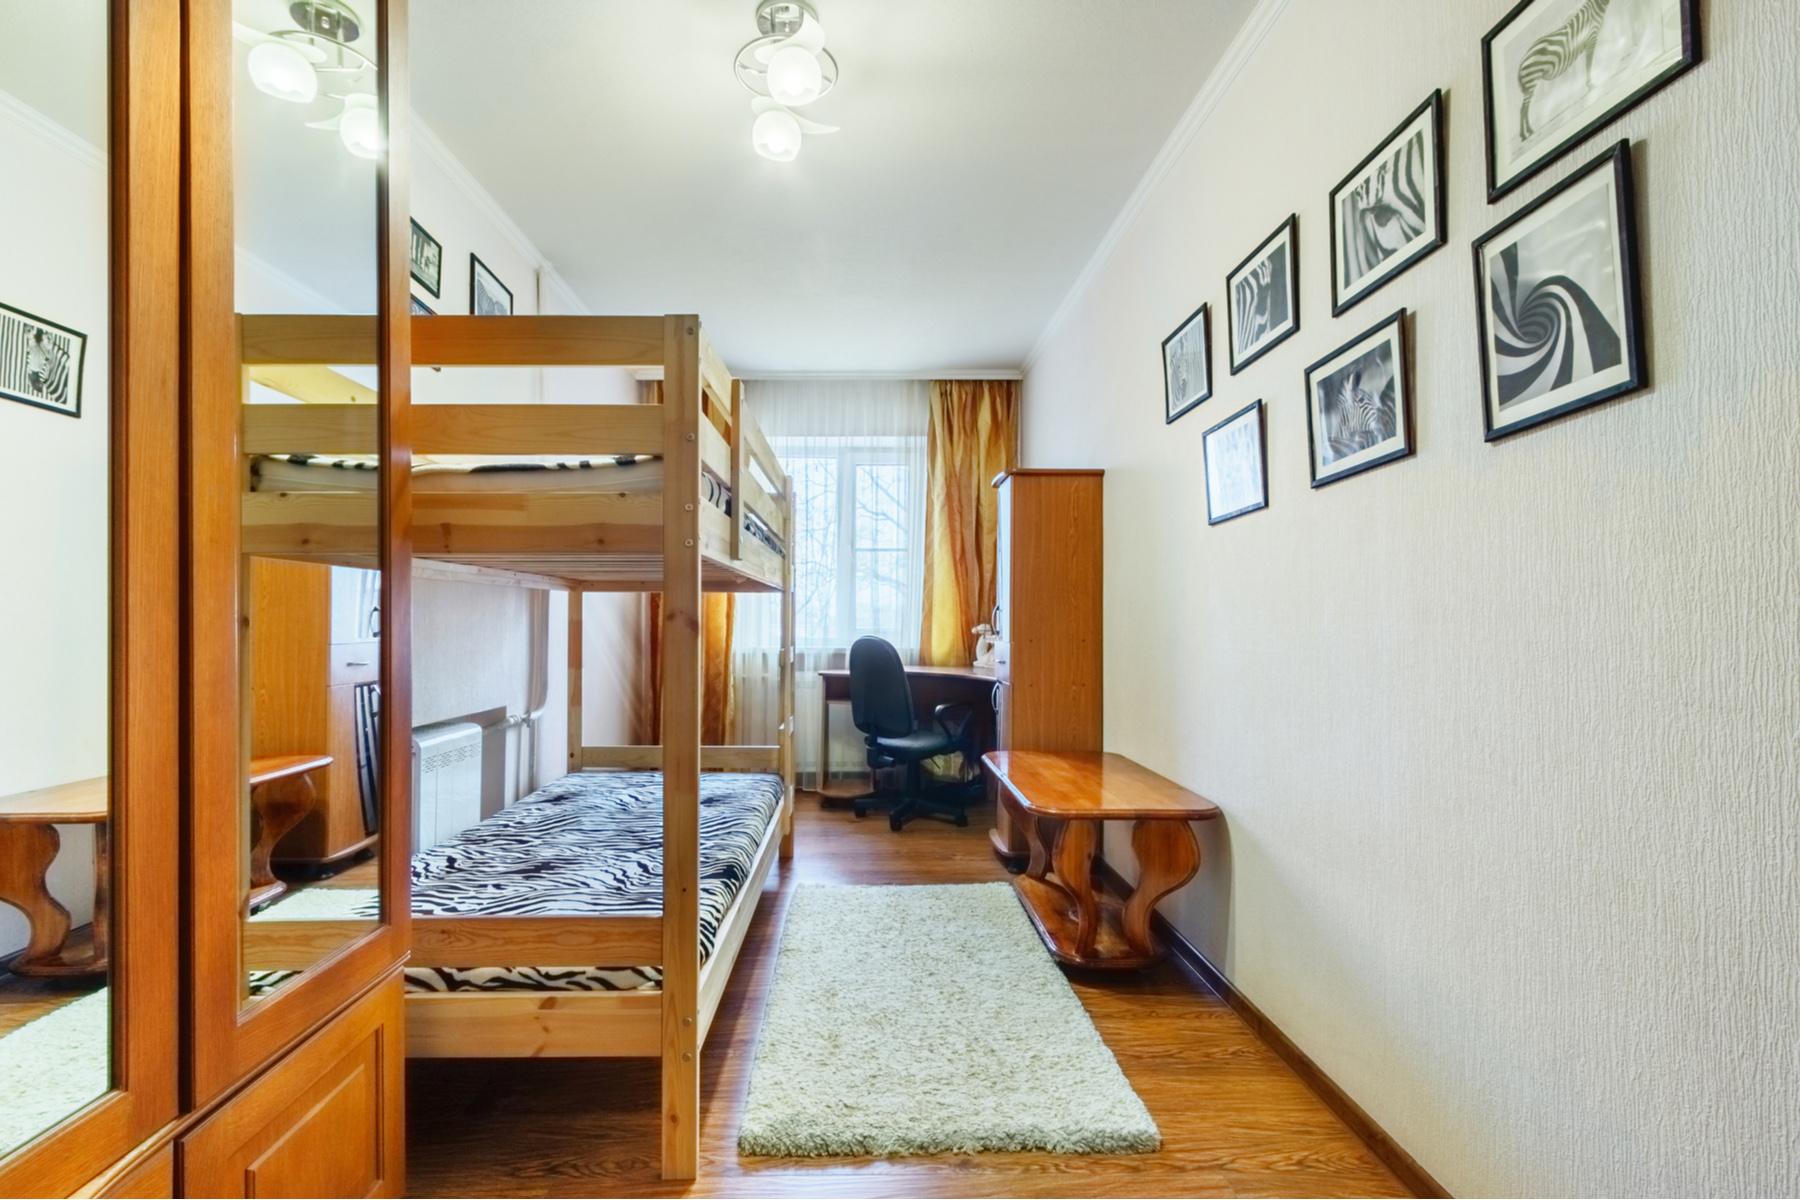 Student dorm at a Russian university